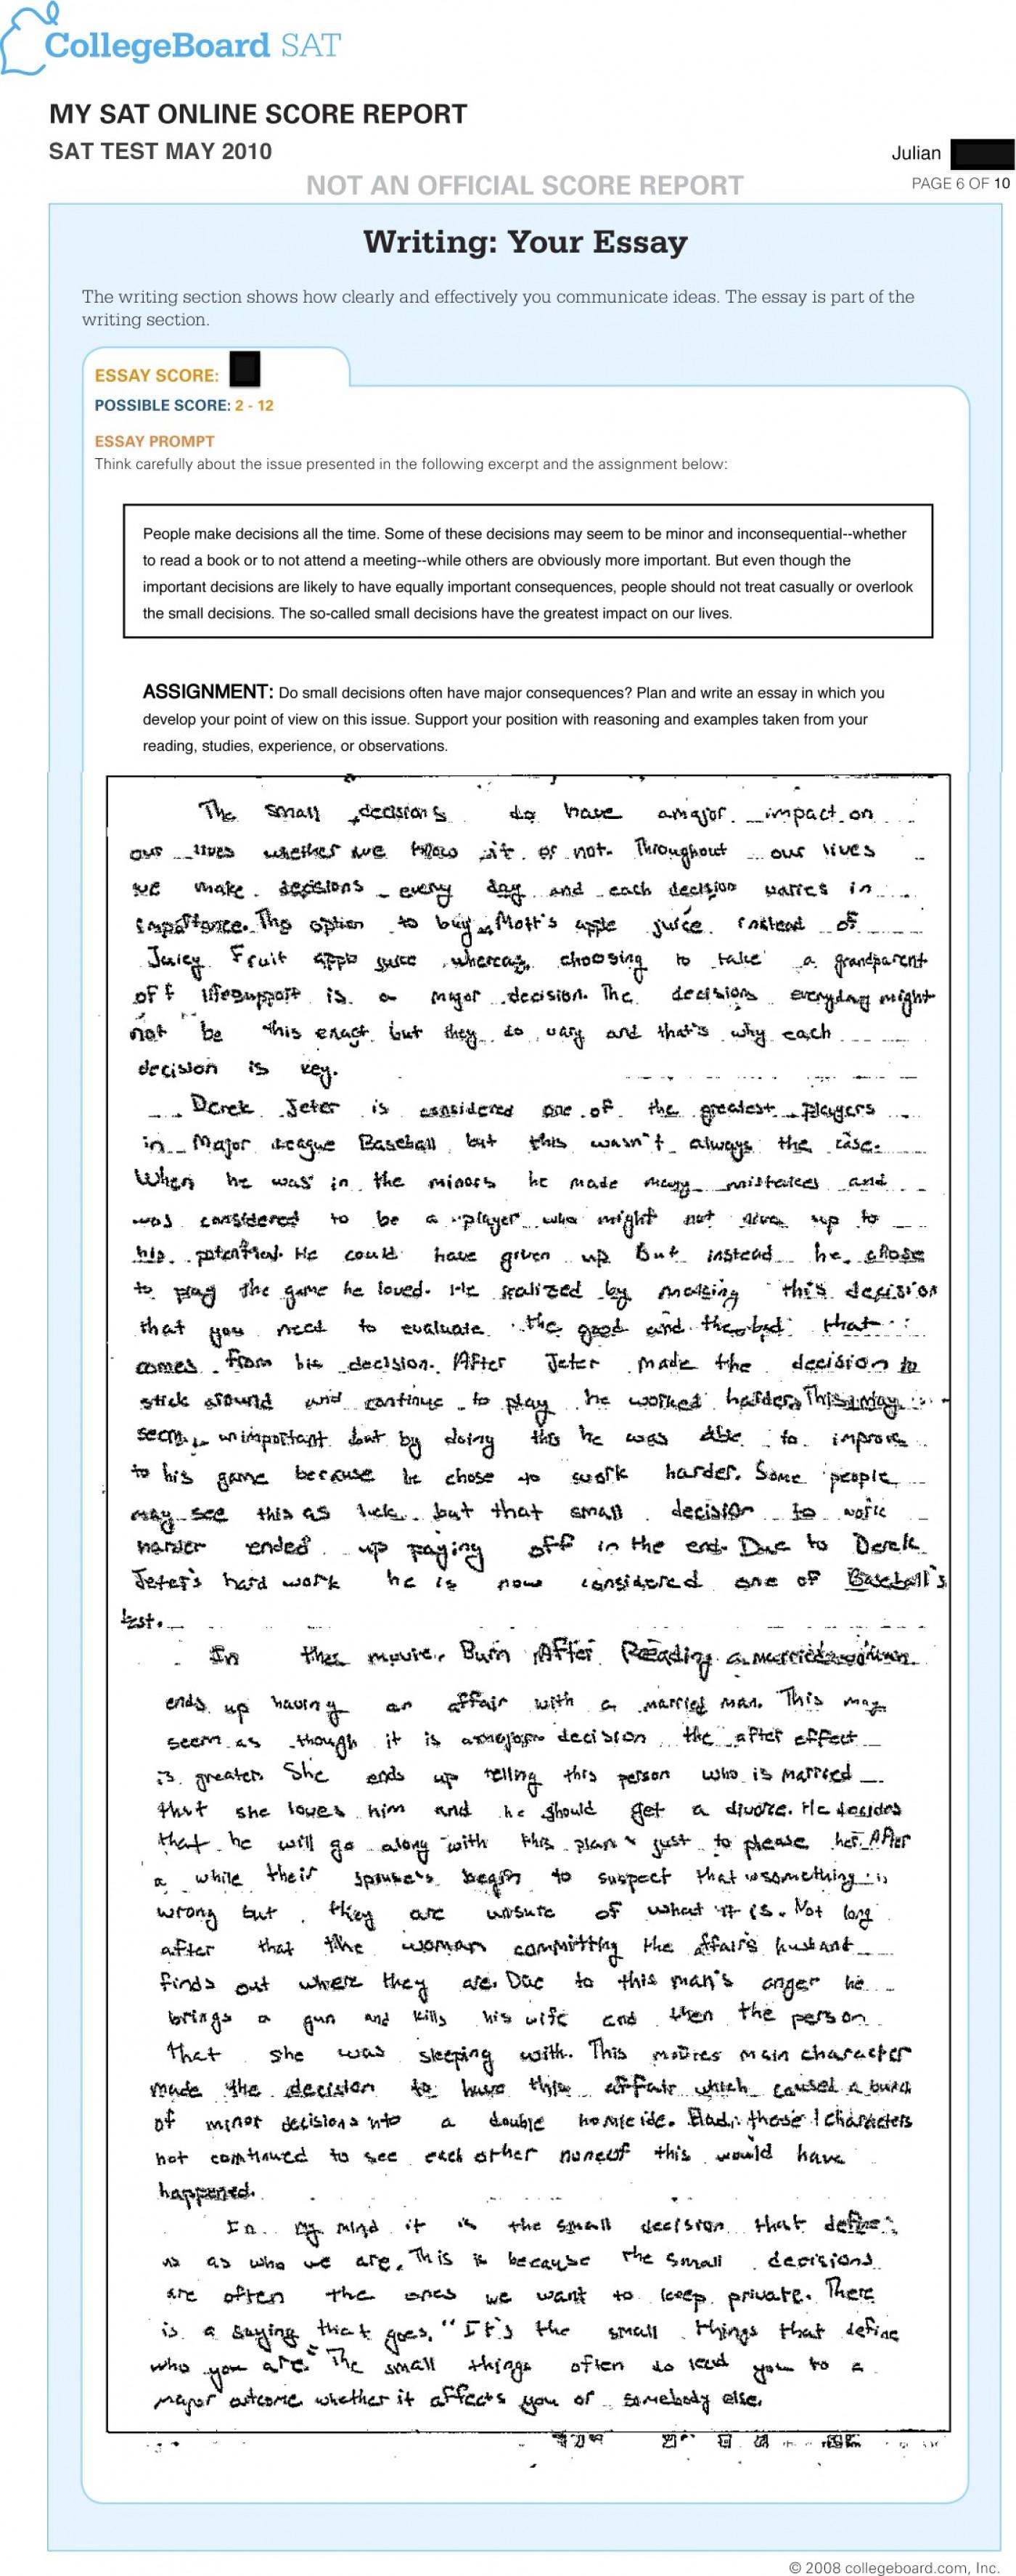 011 Essay Example Sat Prompts Jr May Surprising 2015 2017 Prompt June 1400